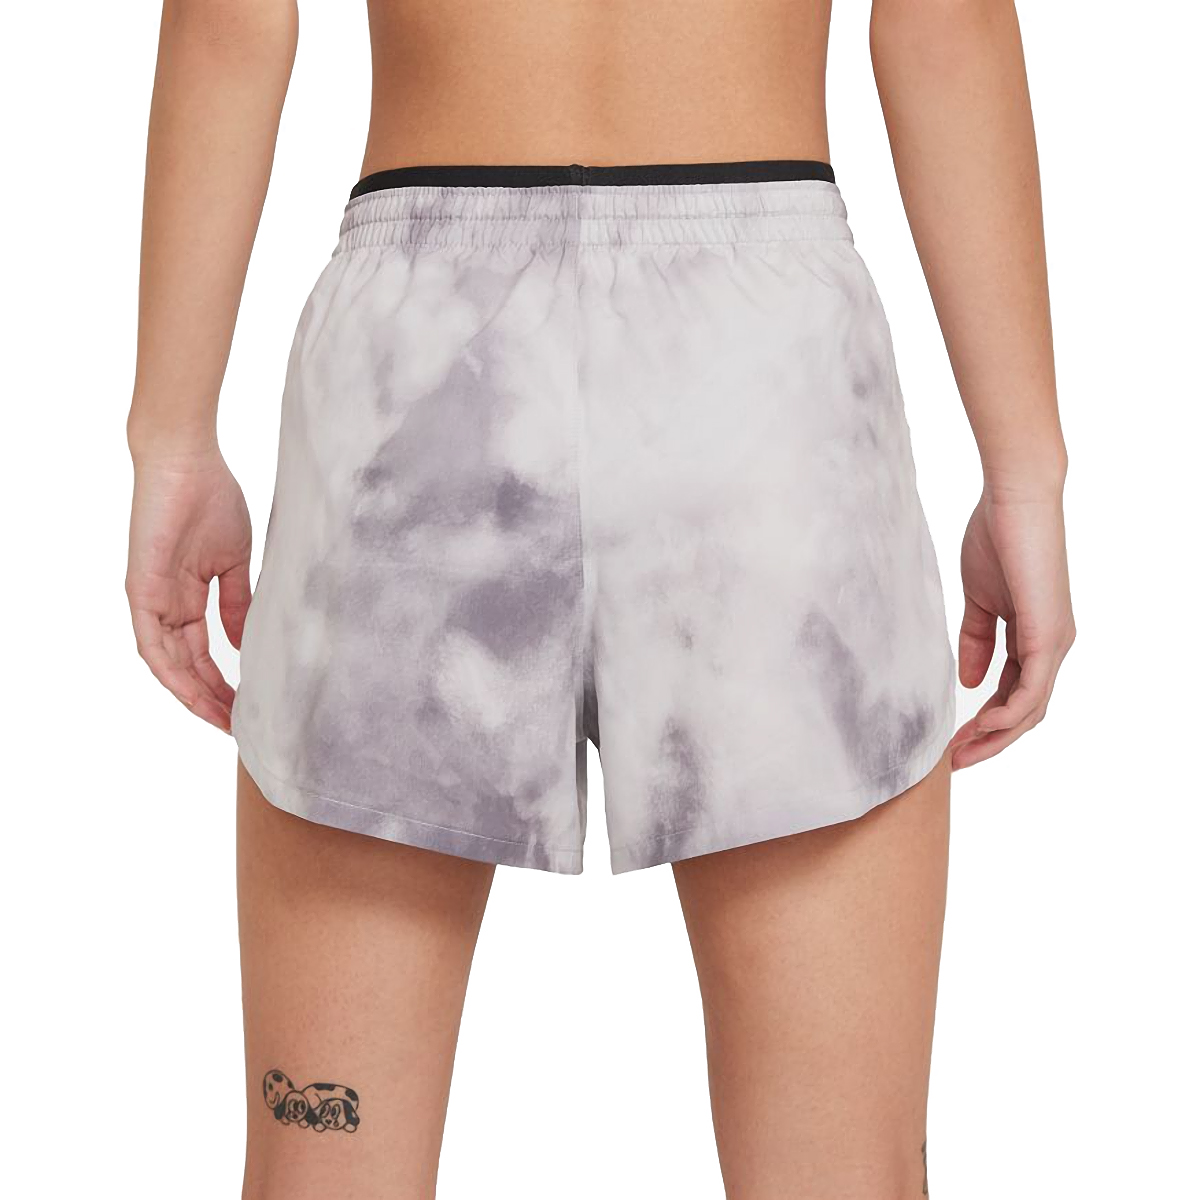 Women's Nike Tempo Luxe Icon Clash Running Shorts - Color: Light Smoke Grey/Dark Smoke Grey/Iron Grey - Size: XS, Light Smoke Grey/Dark Smoke Grey/Iron Grey, large, image 2